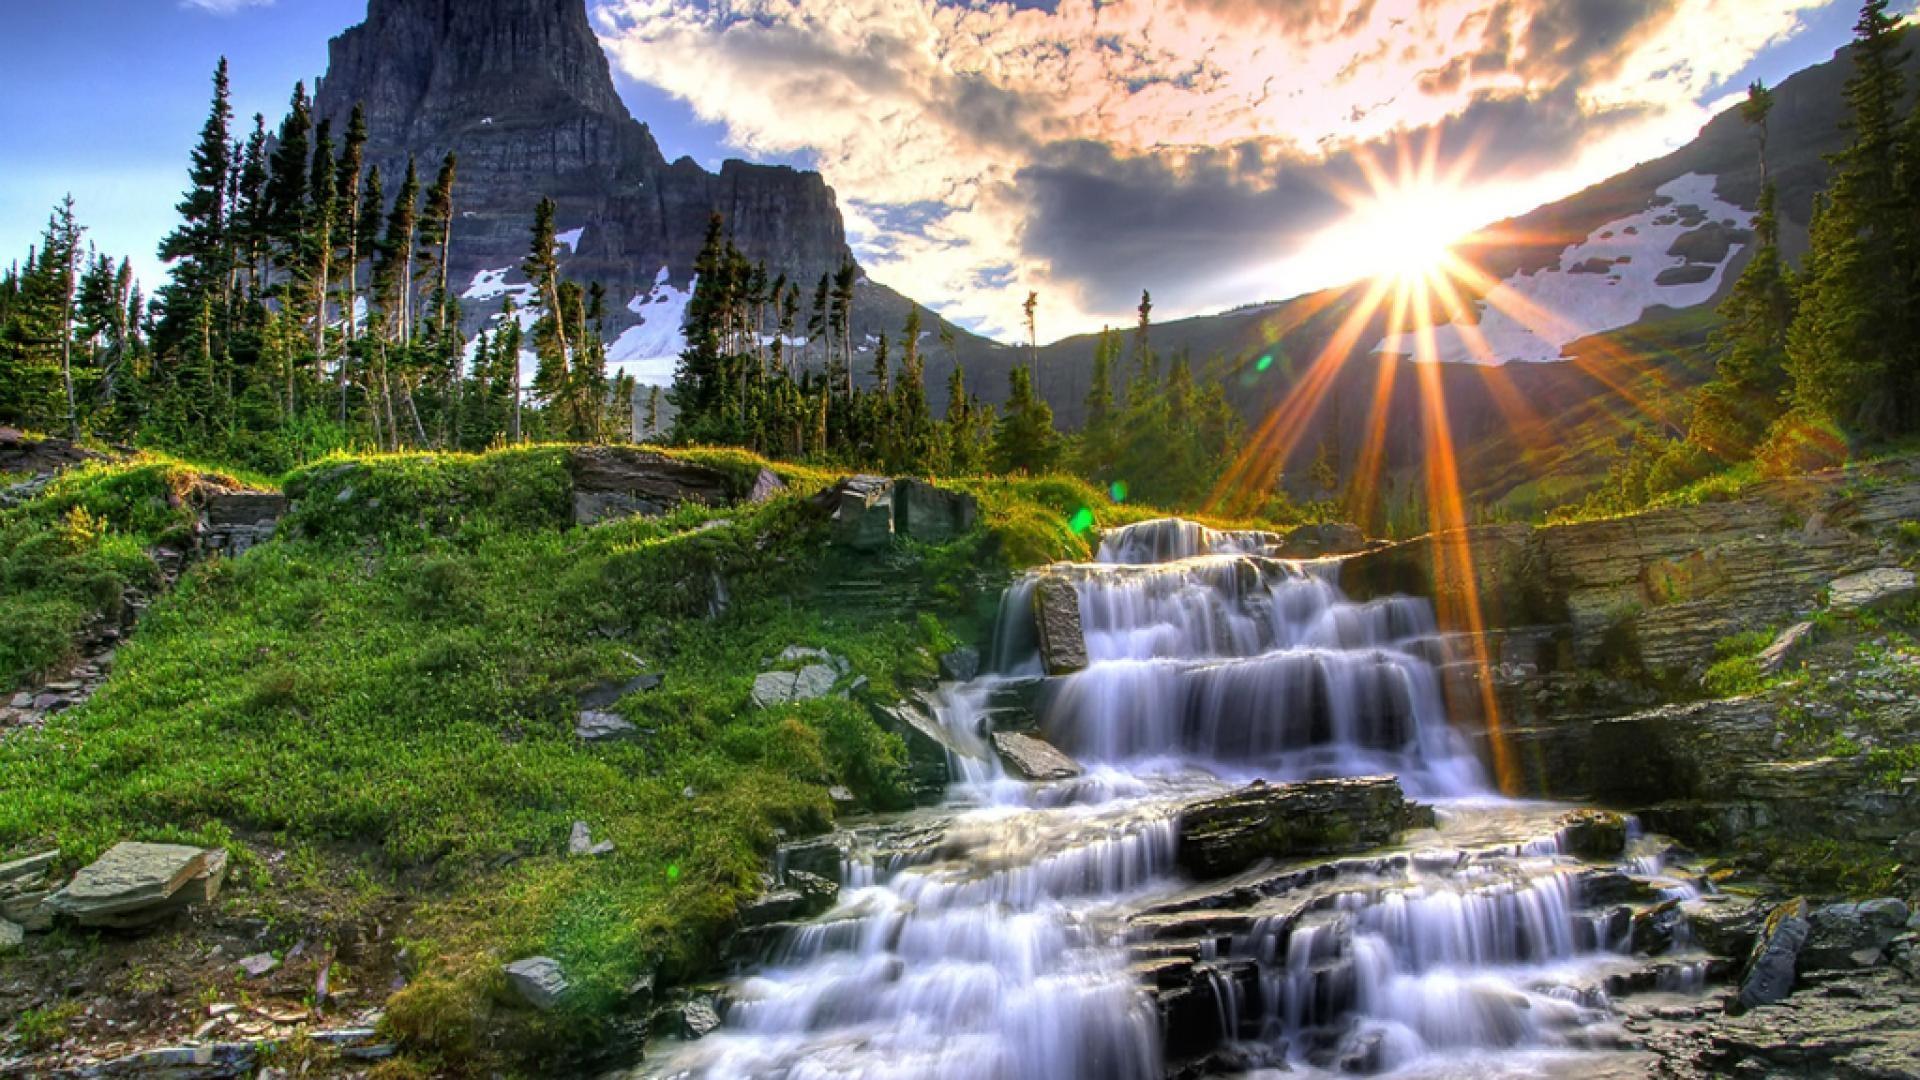 2560x1440 Nature Wallpaper Full Hd 1440p